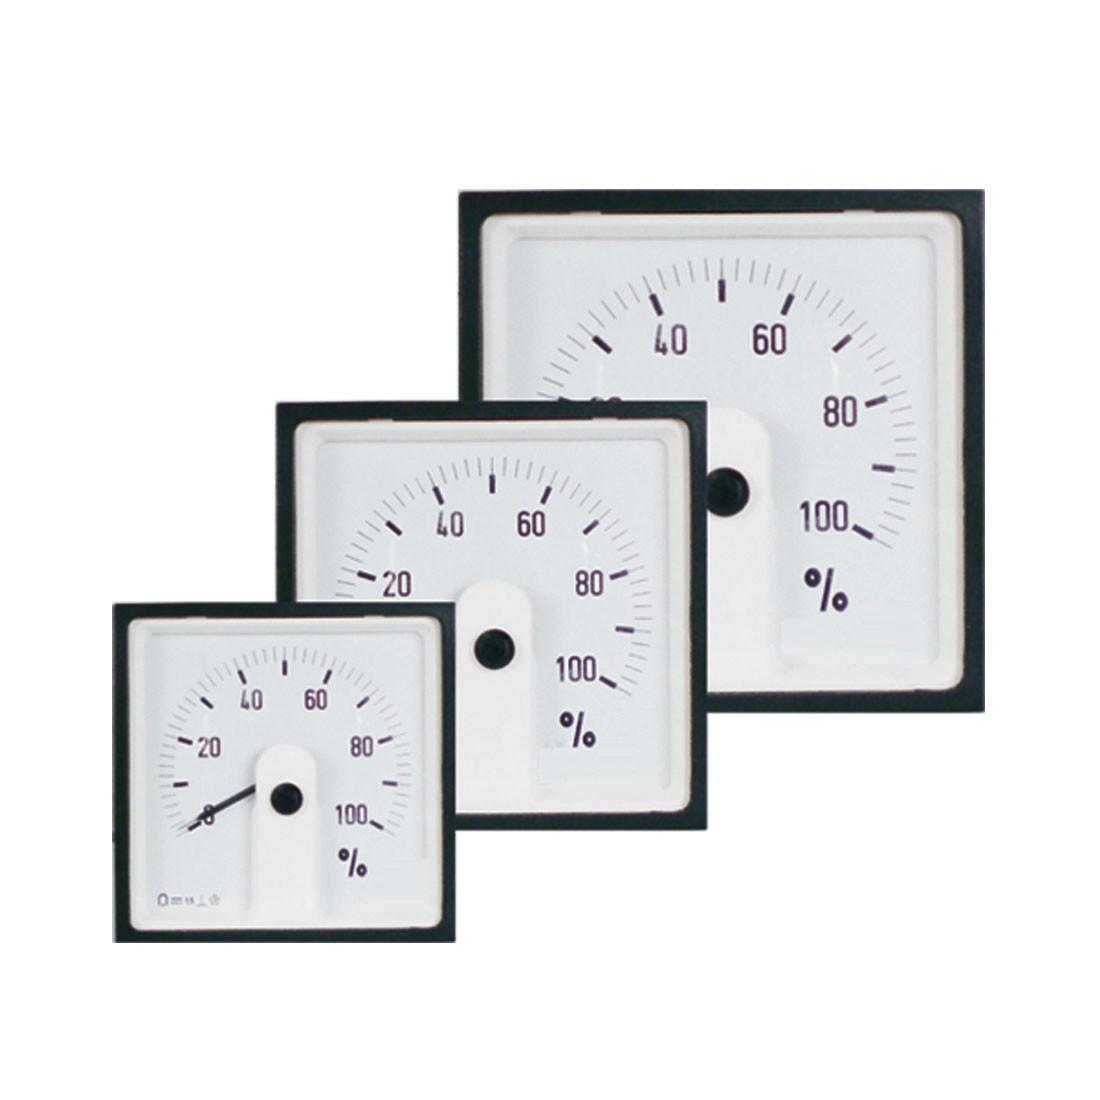 HSDSL Series DC Analog Panel Meters